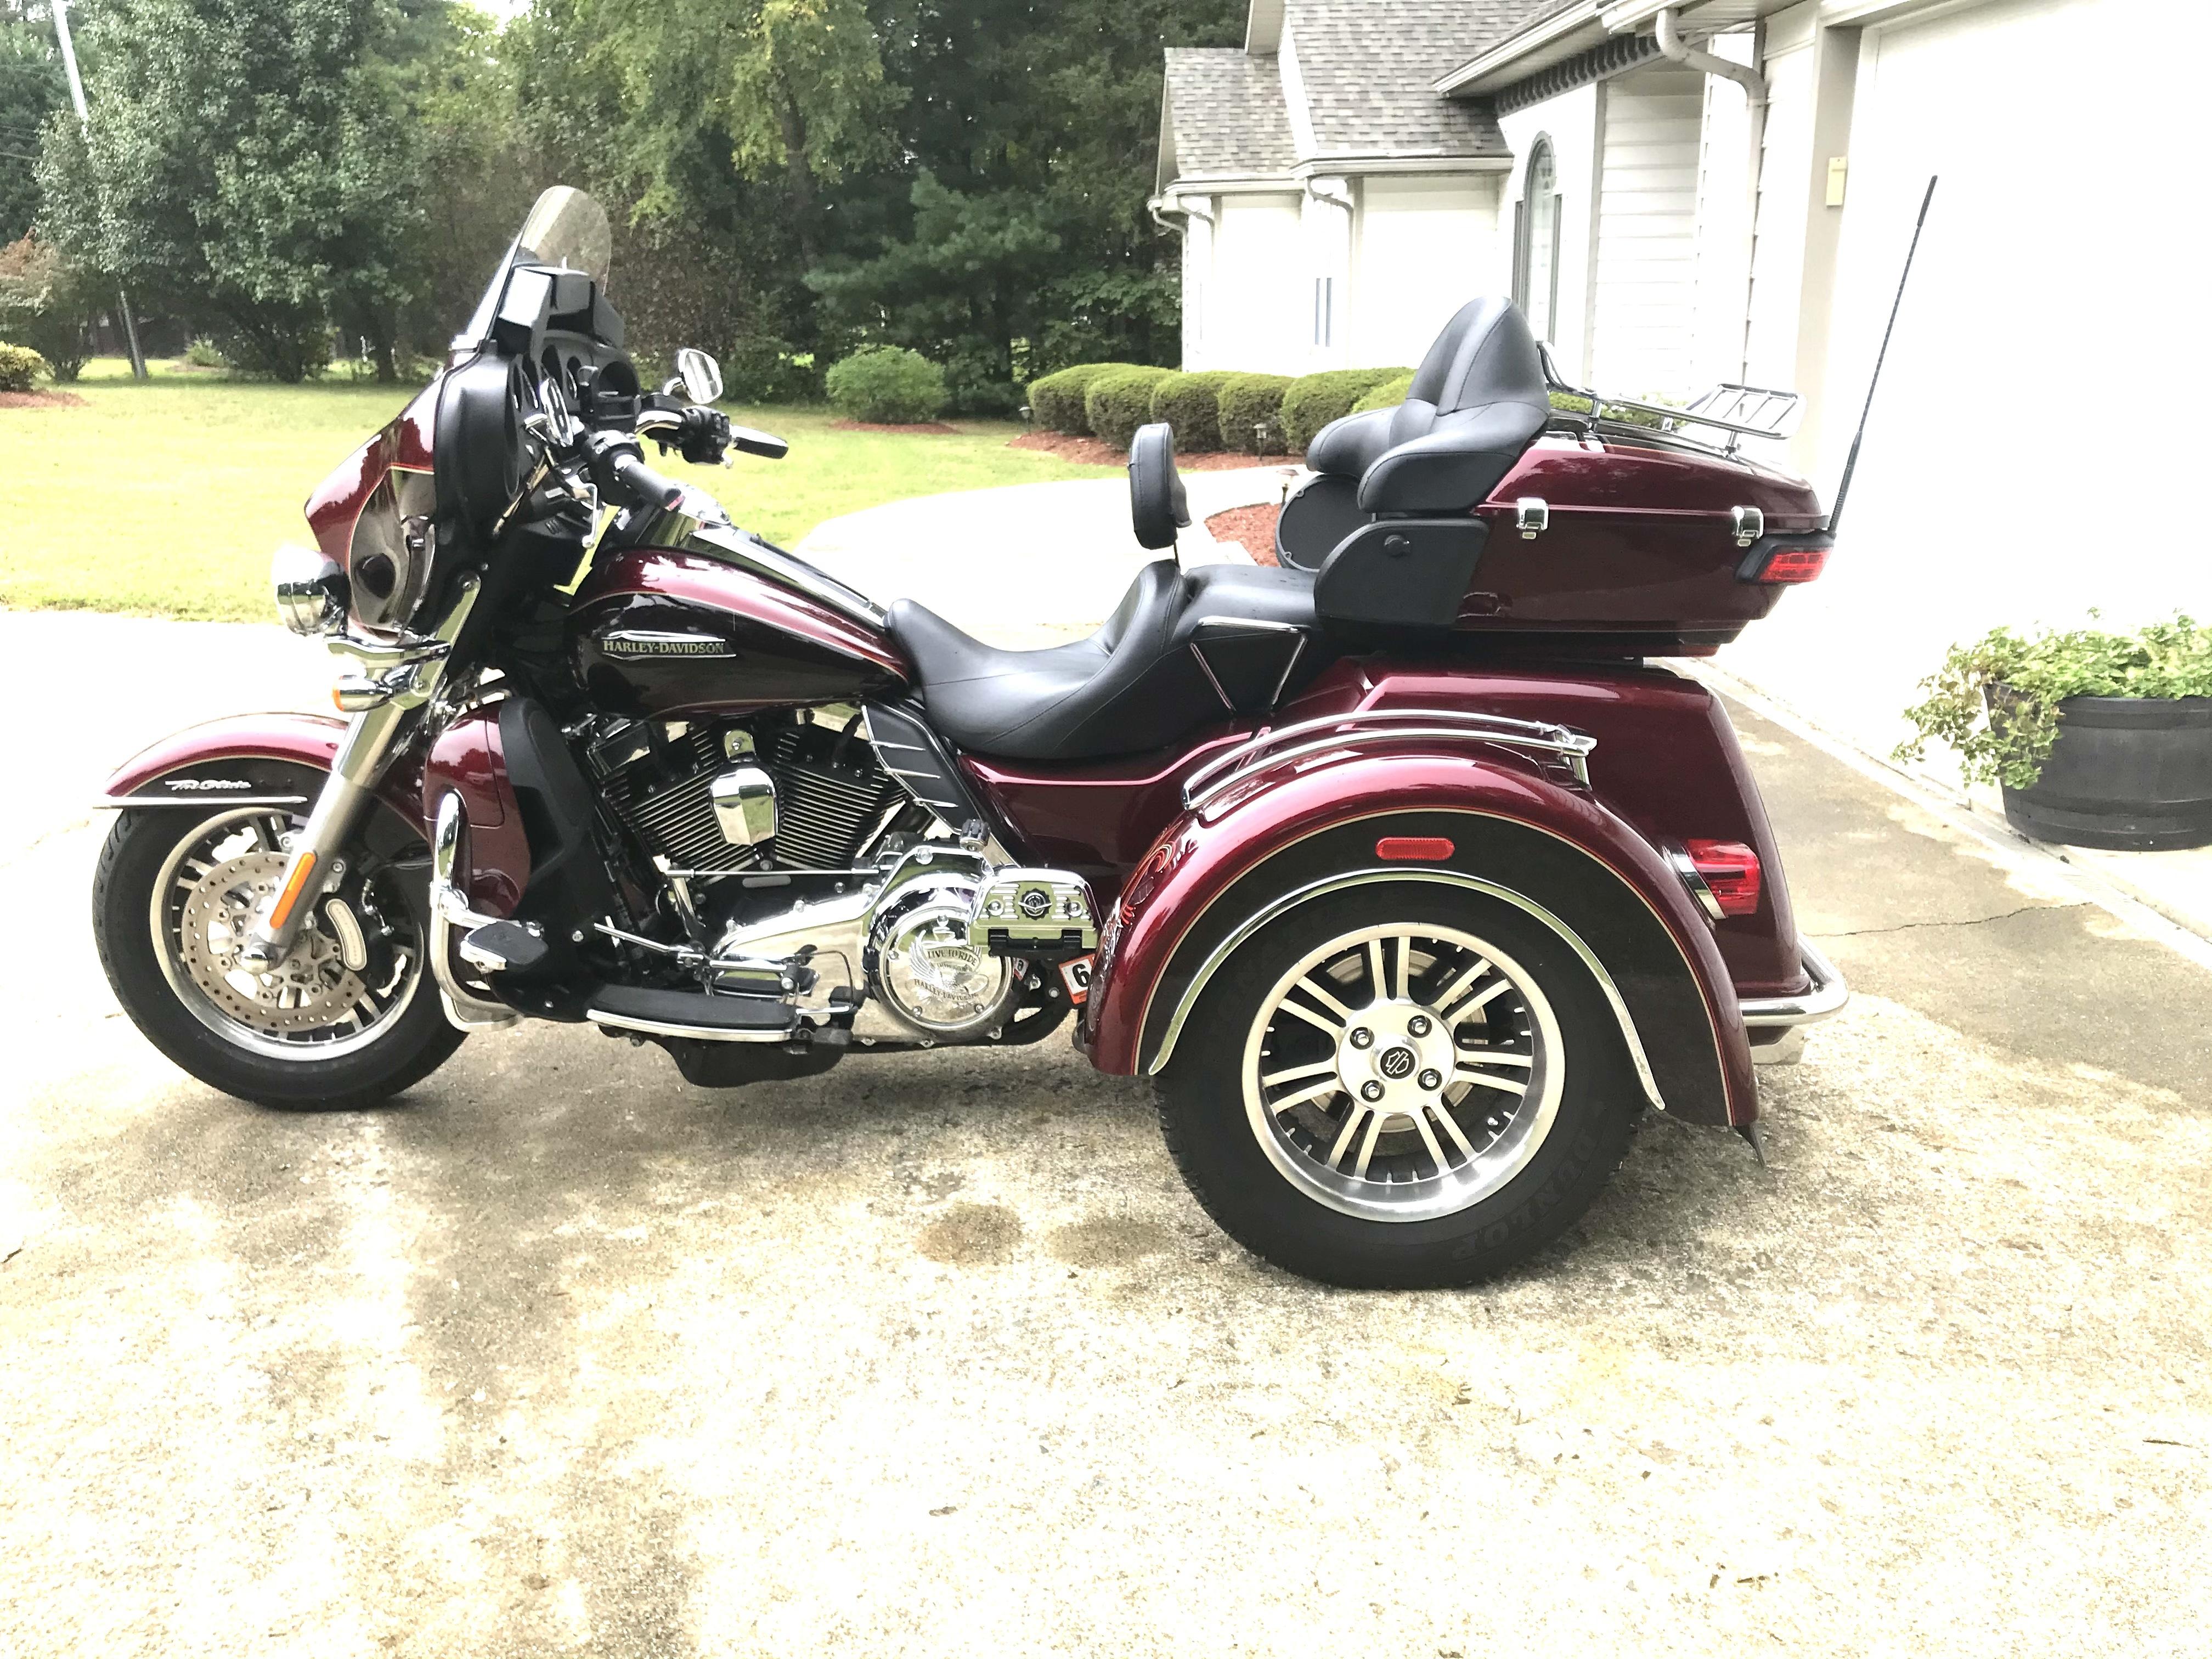 Photo 2014 Harley-Davidson TRI GLIDE ULTRA CLASSIC $23900396.74396.74